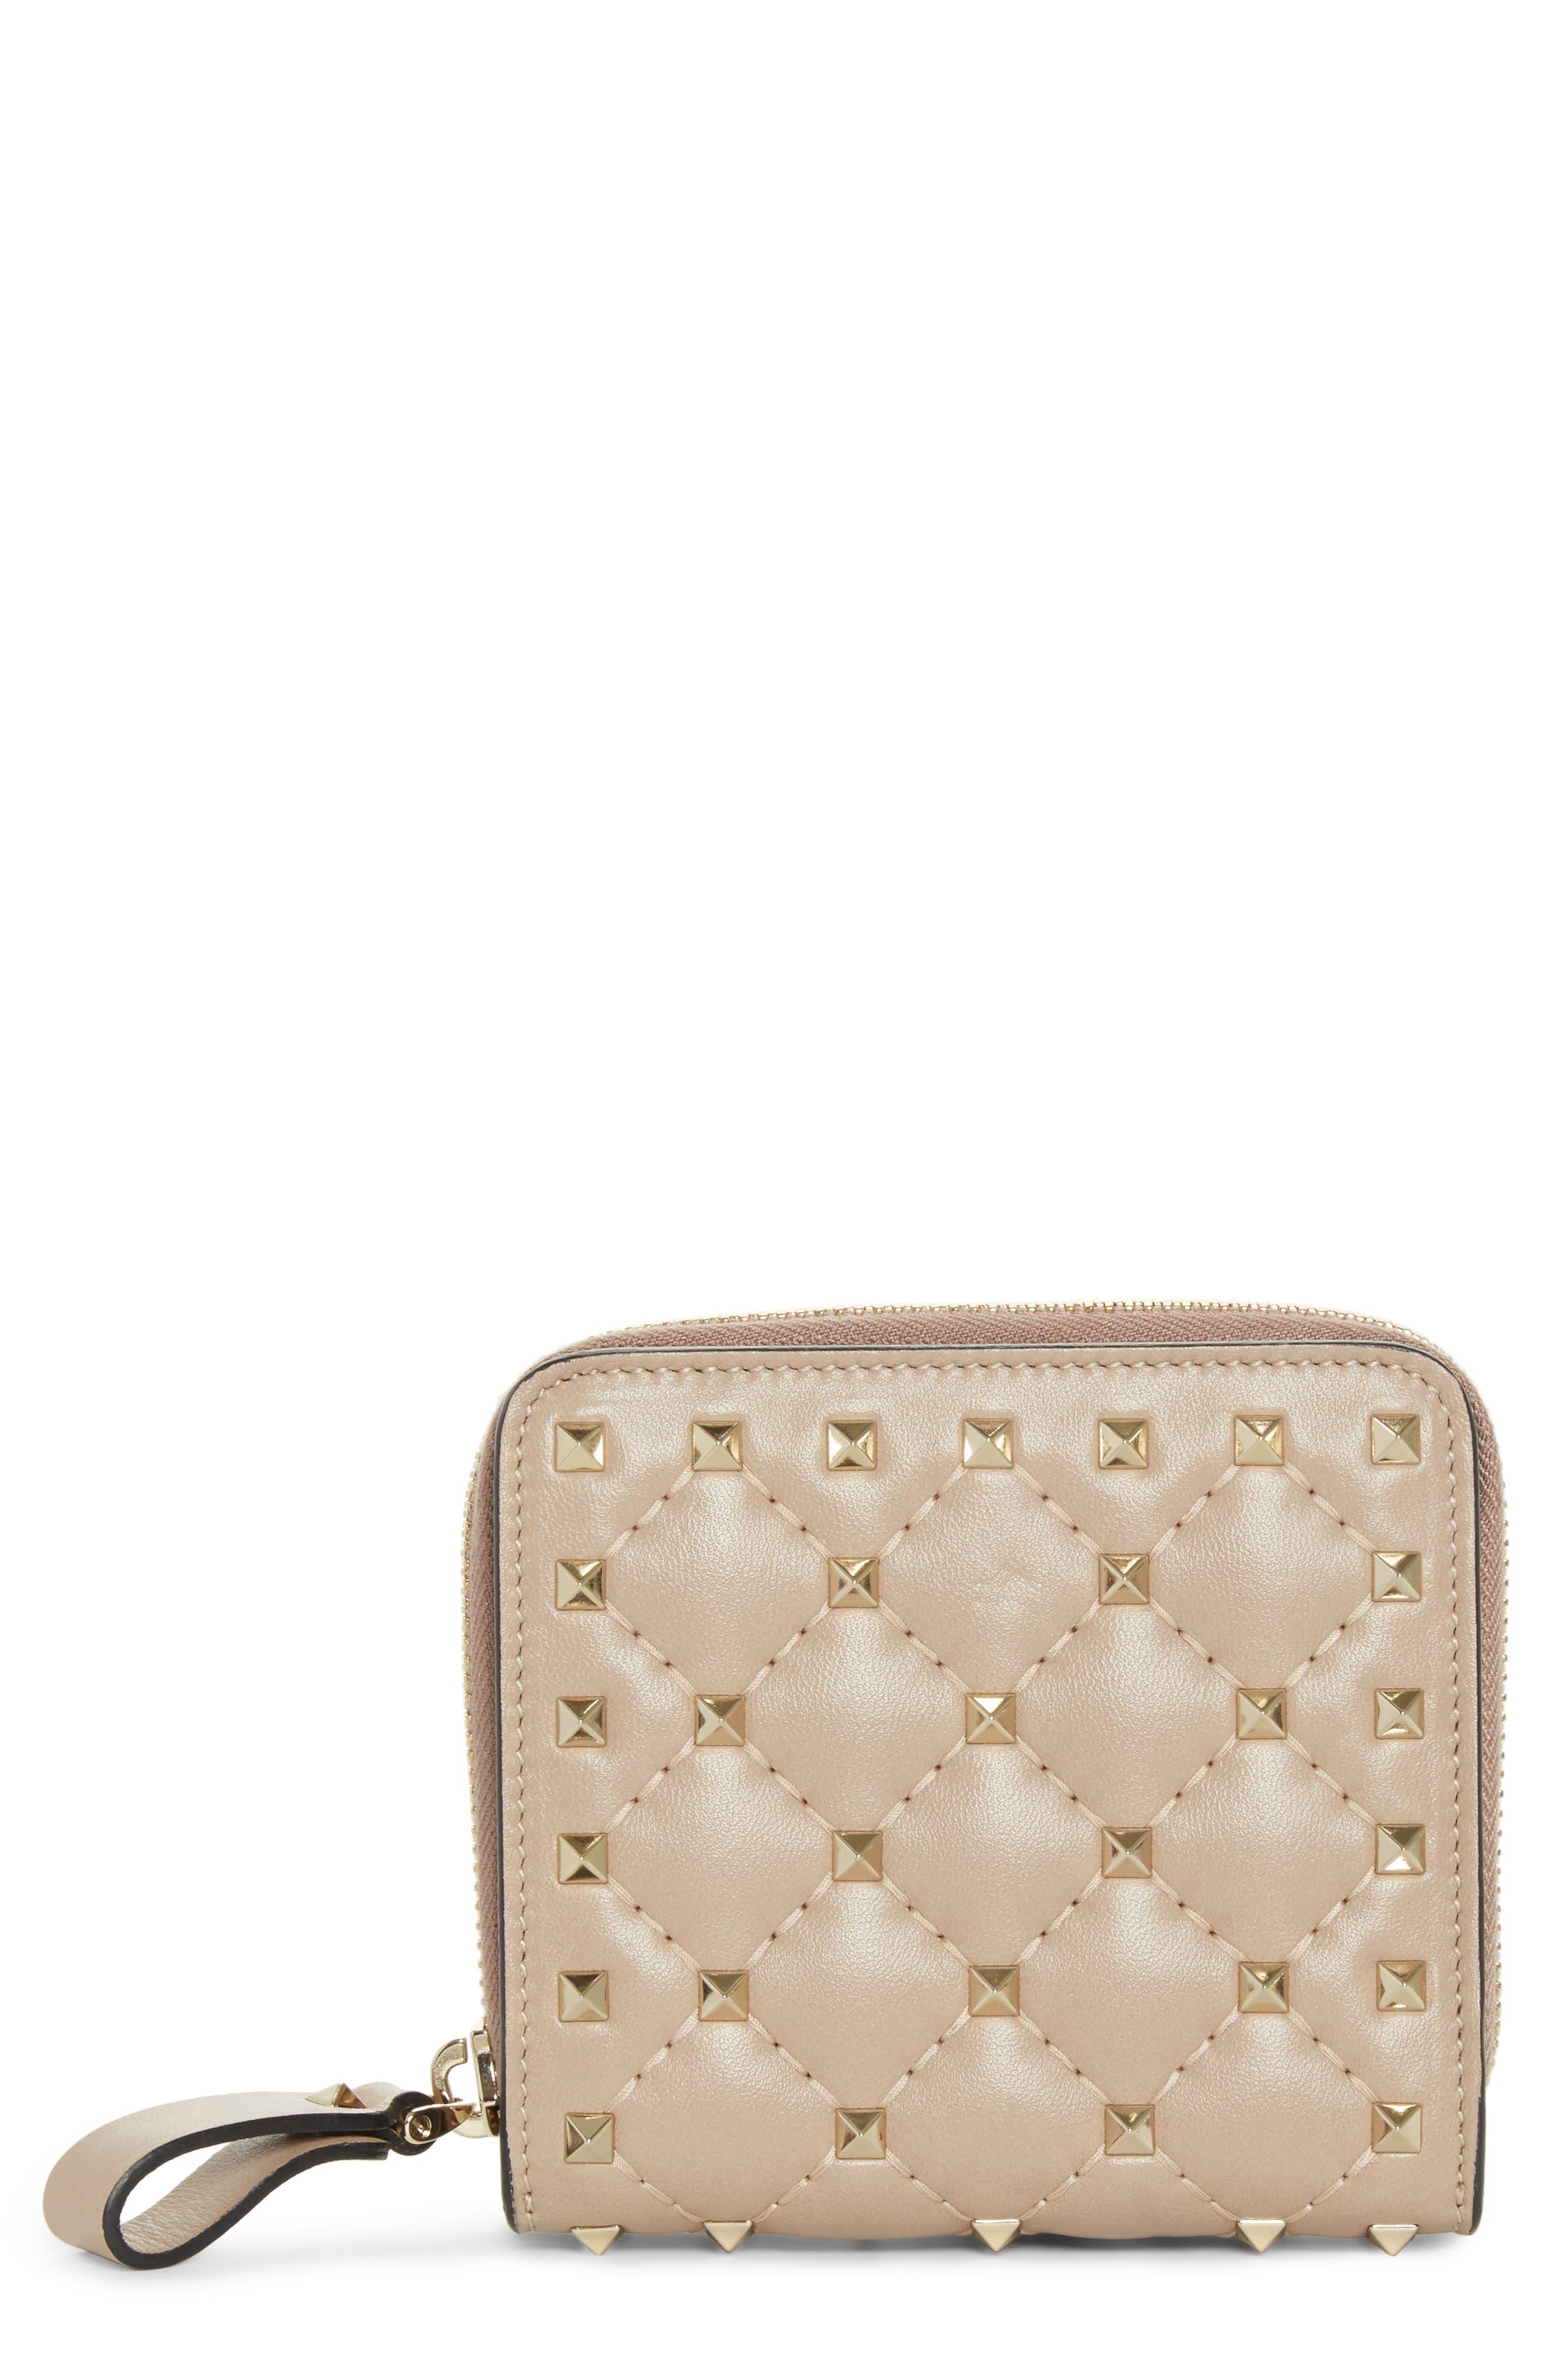 Alternate Image 1 Selected - VALENTINO GARAVANI Rockstud Matelassé Leather French Wallet